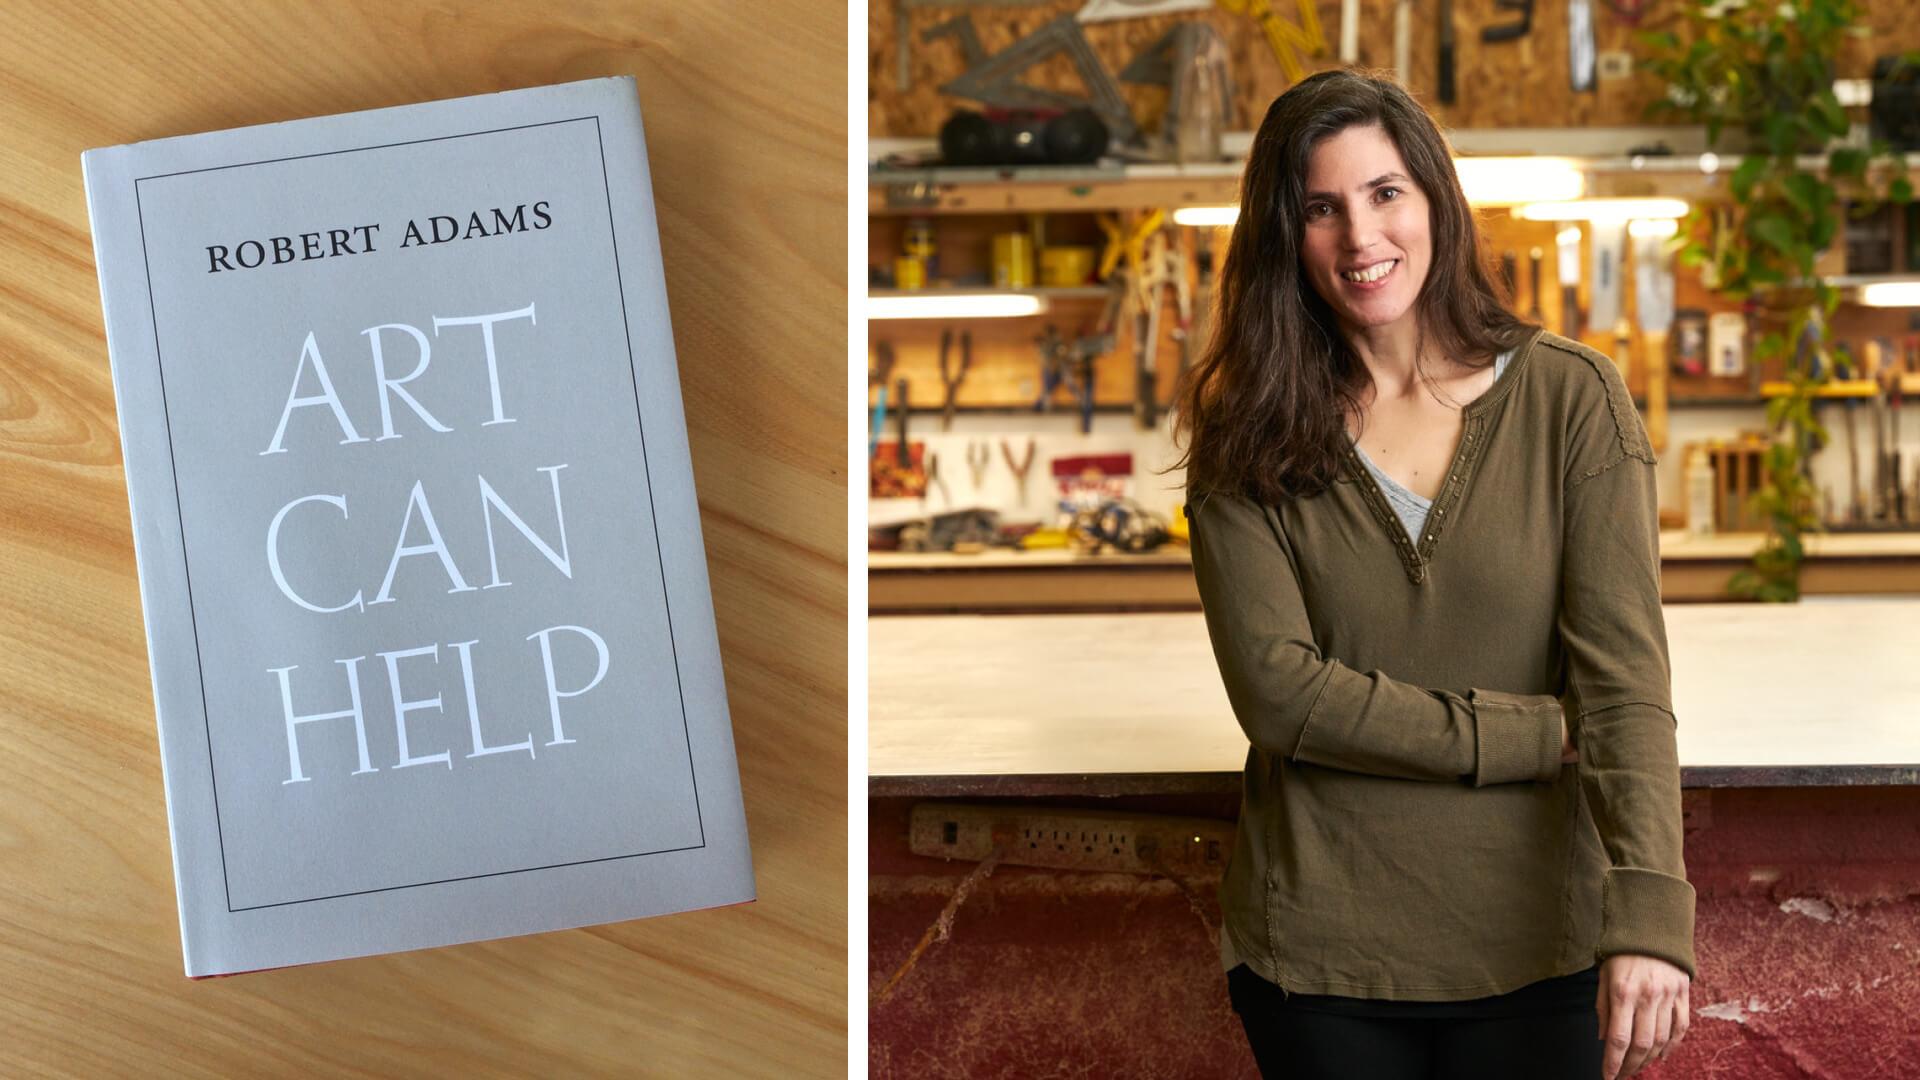 Artist Lauren Henkin is reading Art Can Help, a collection of essays by photographer Robert Adams | What Am I Reading: Lauren Henkin | STIRworld